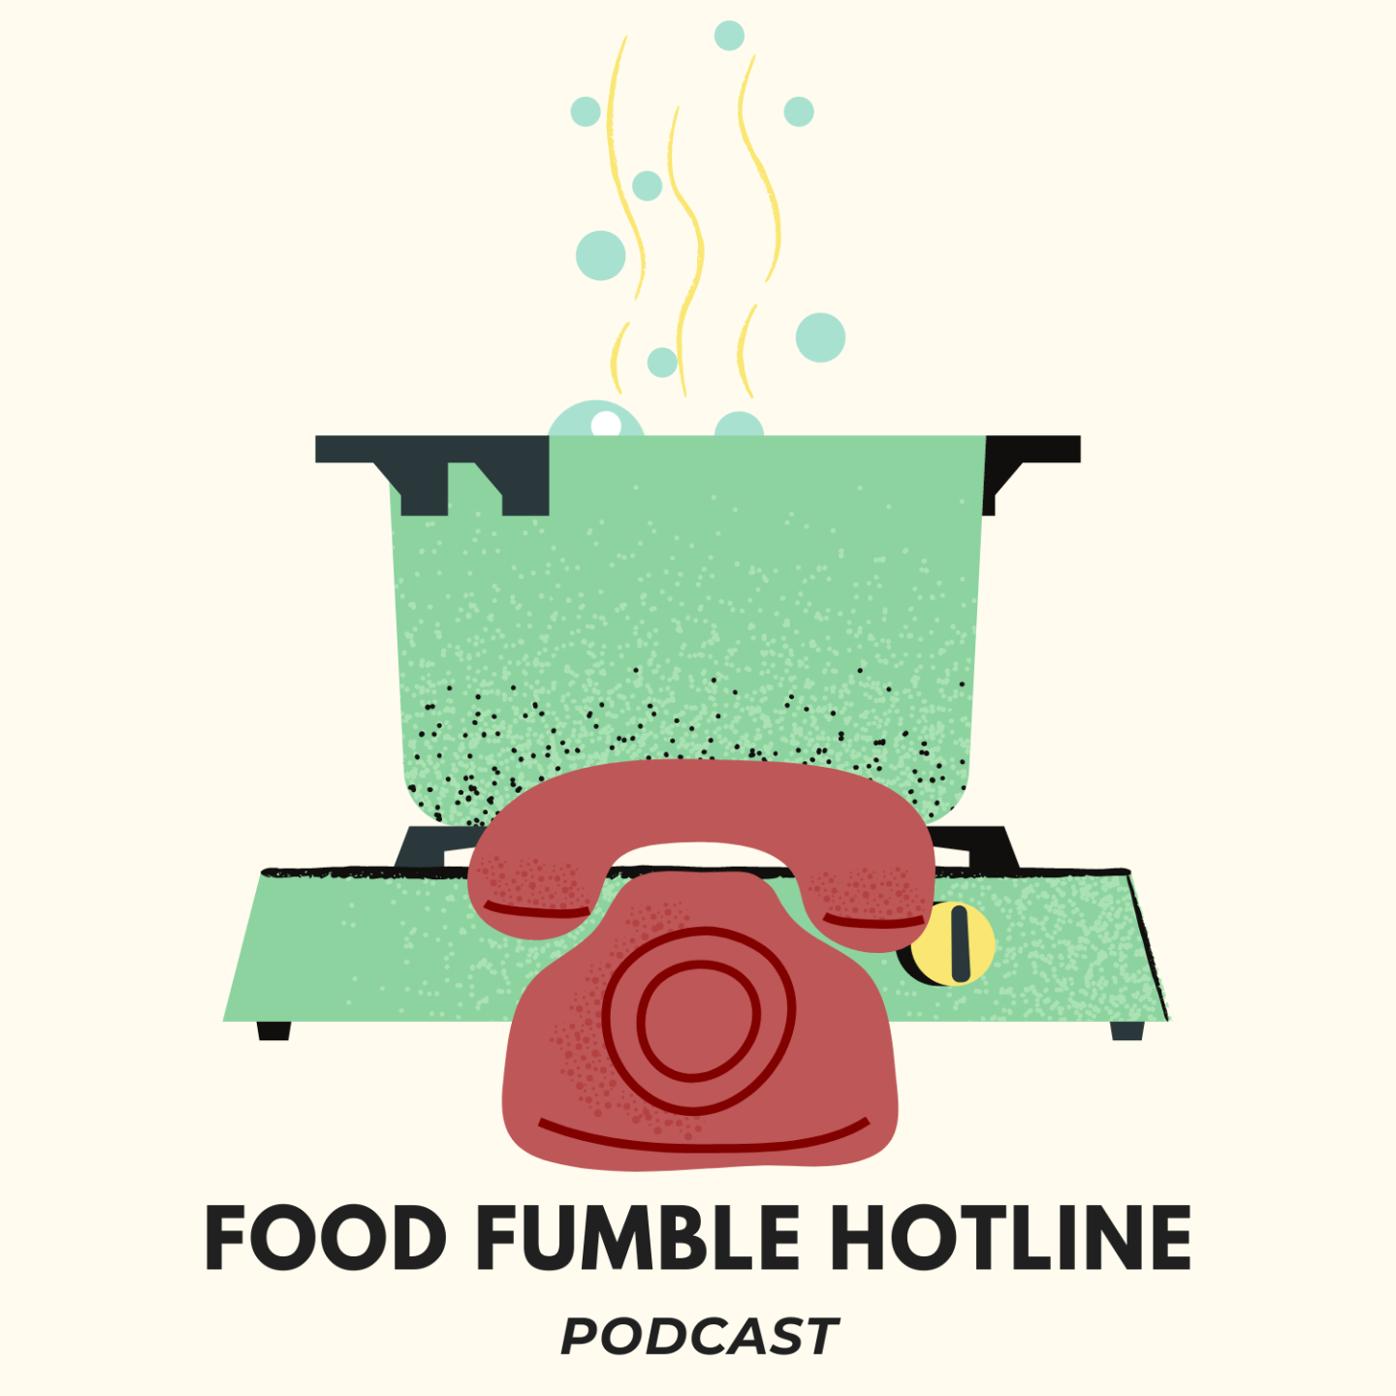 Food Fumble Hotline: Leave Your Pancake Rut (Episode 2)